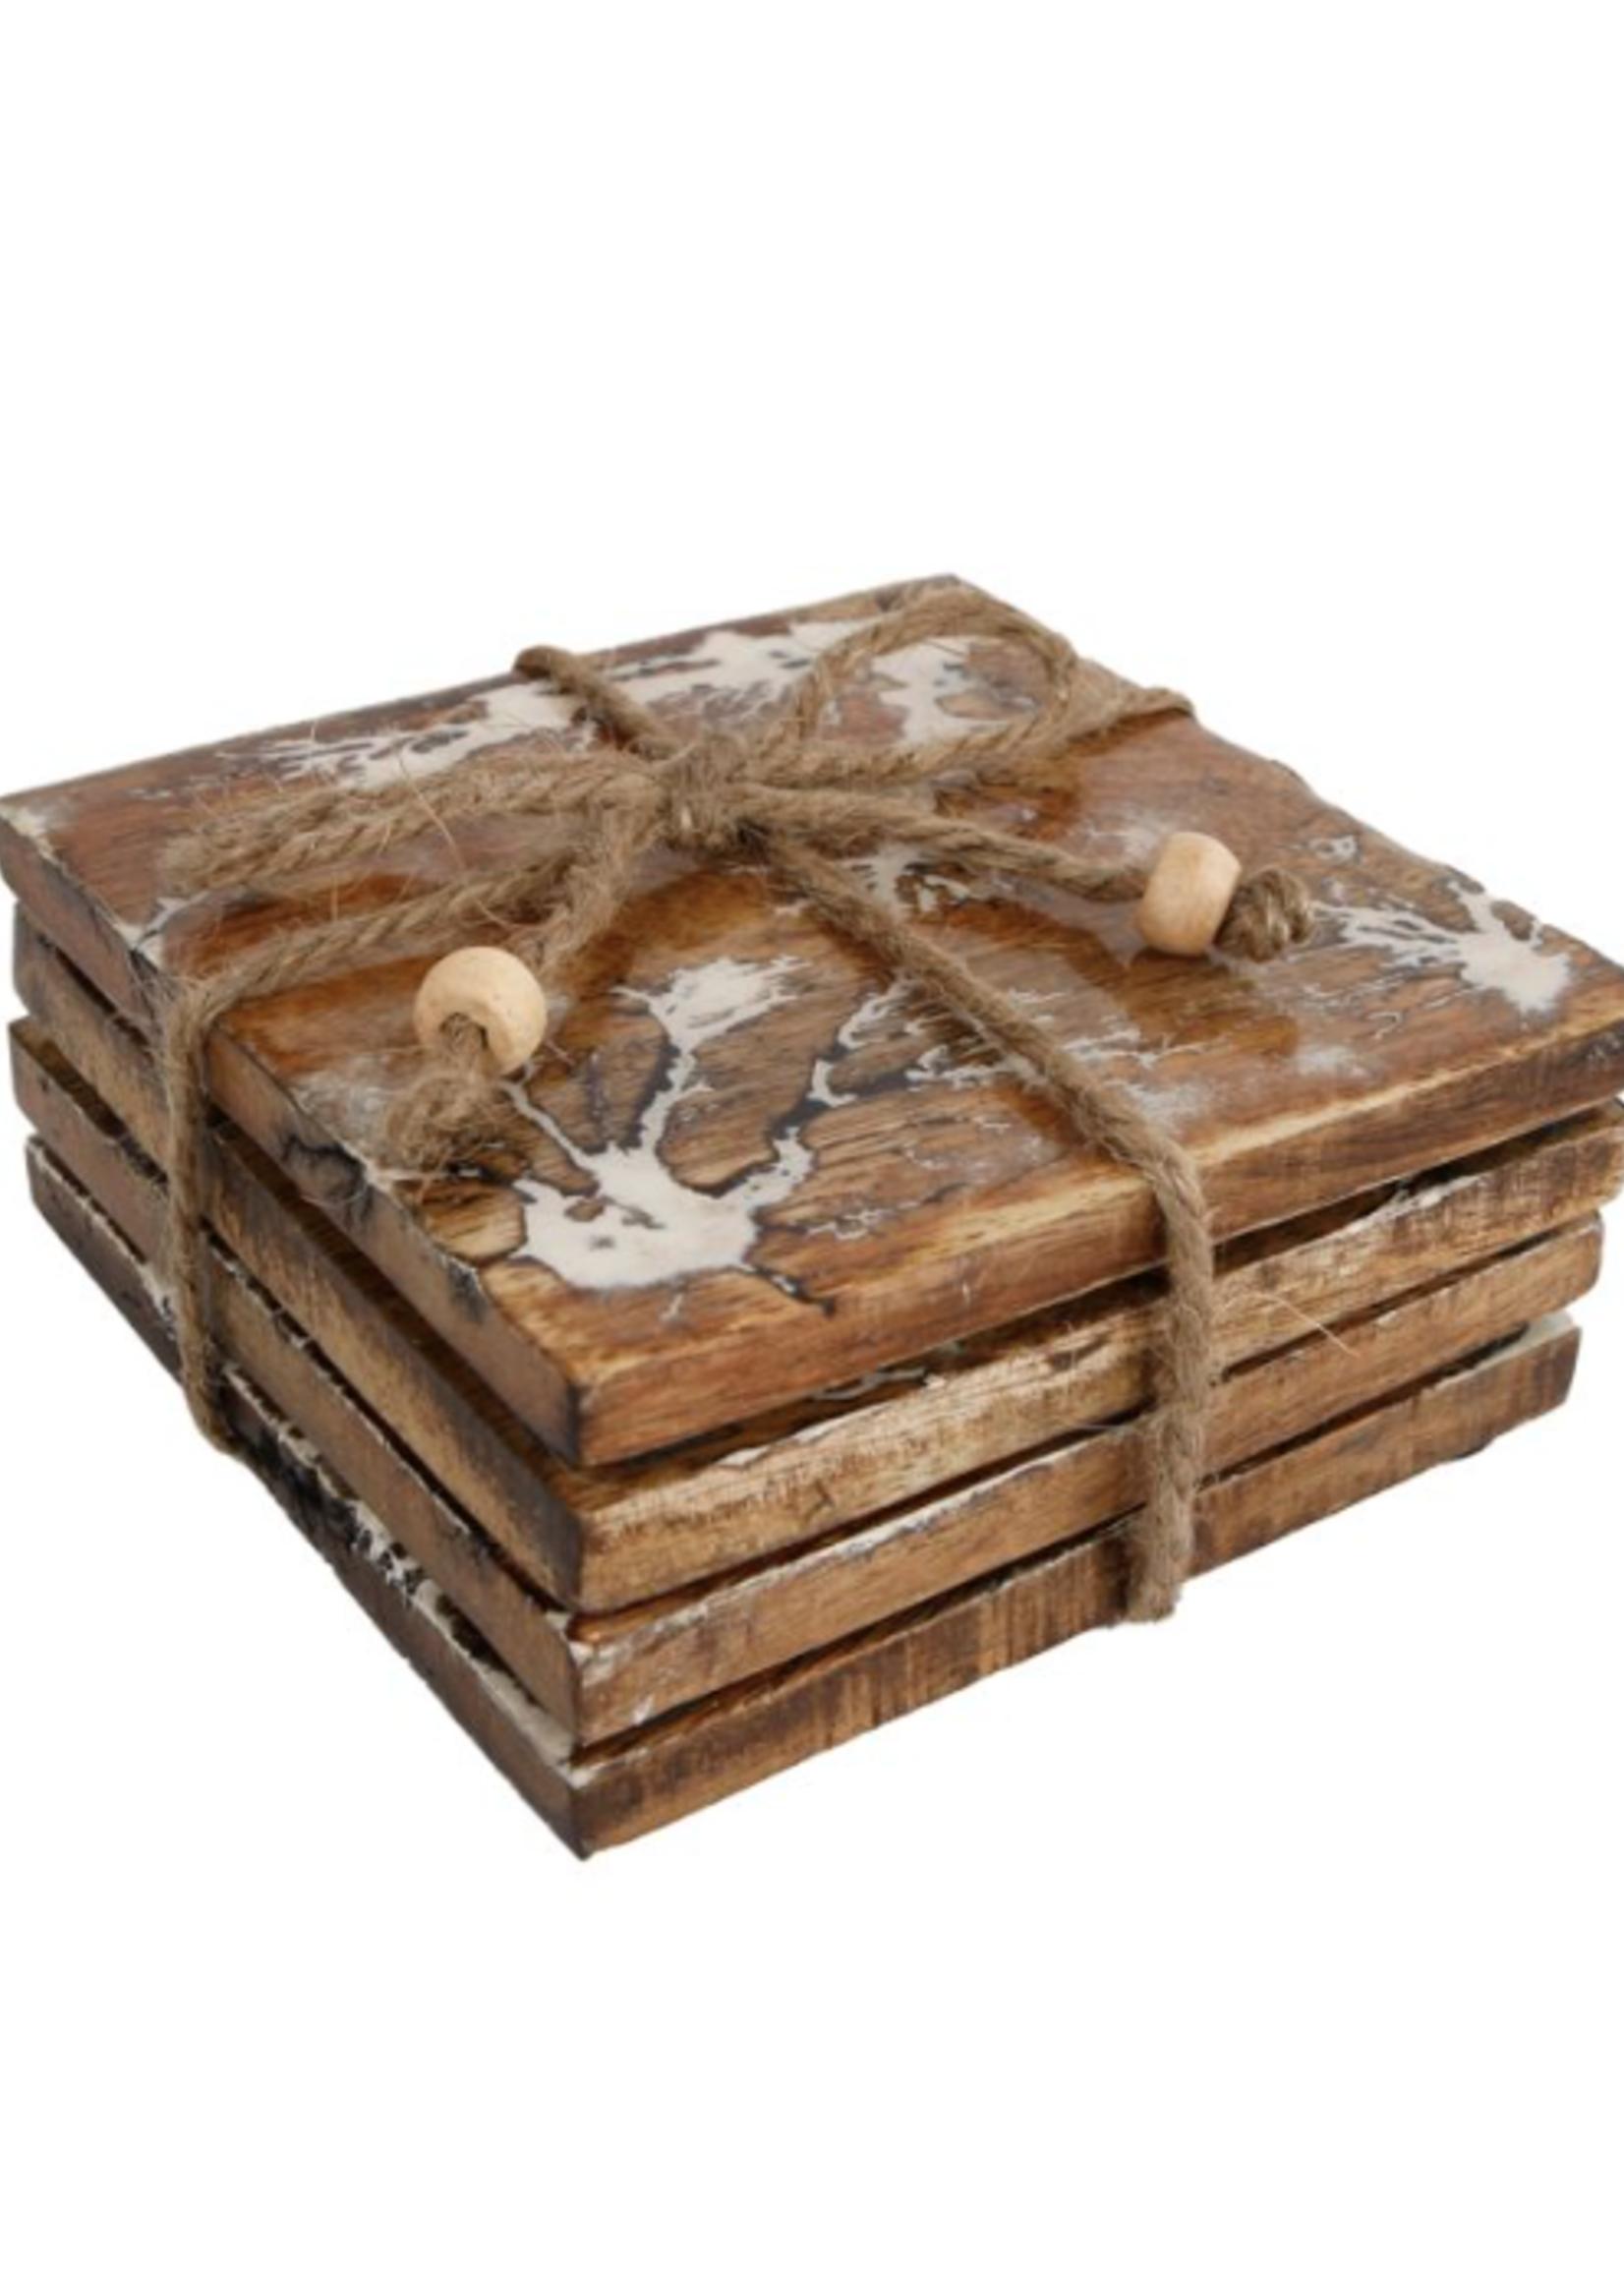 Onderzetters Emaille craquelle wit hout 10x10x4cm